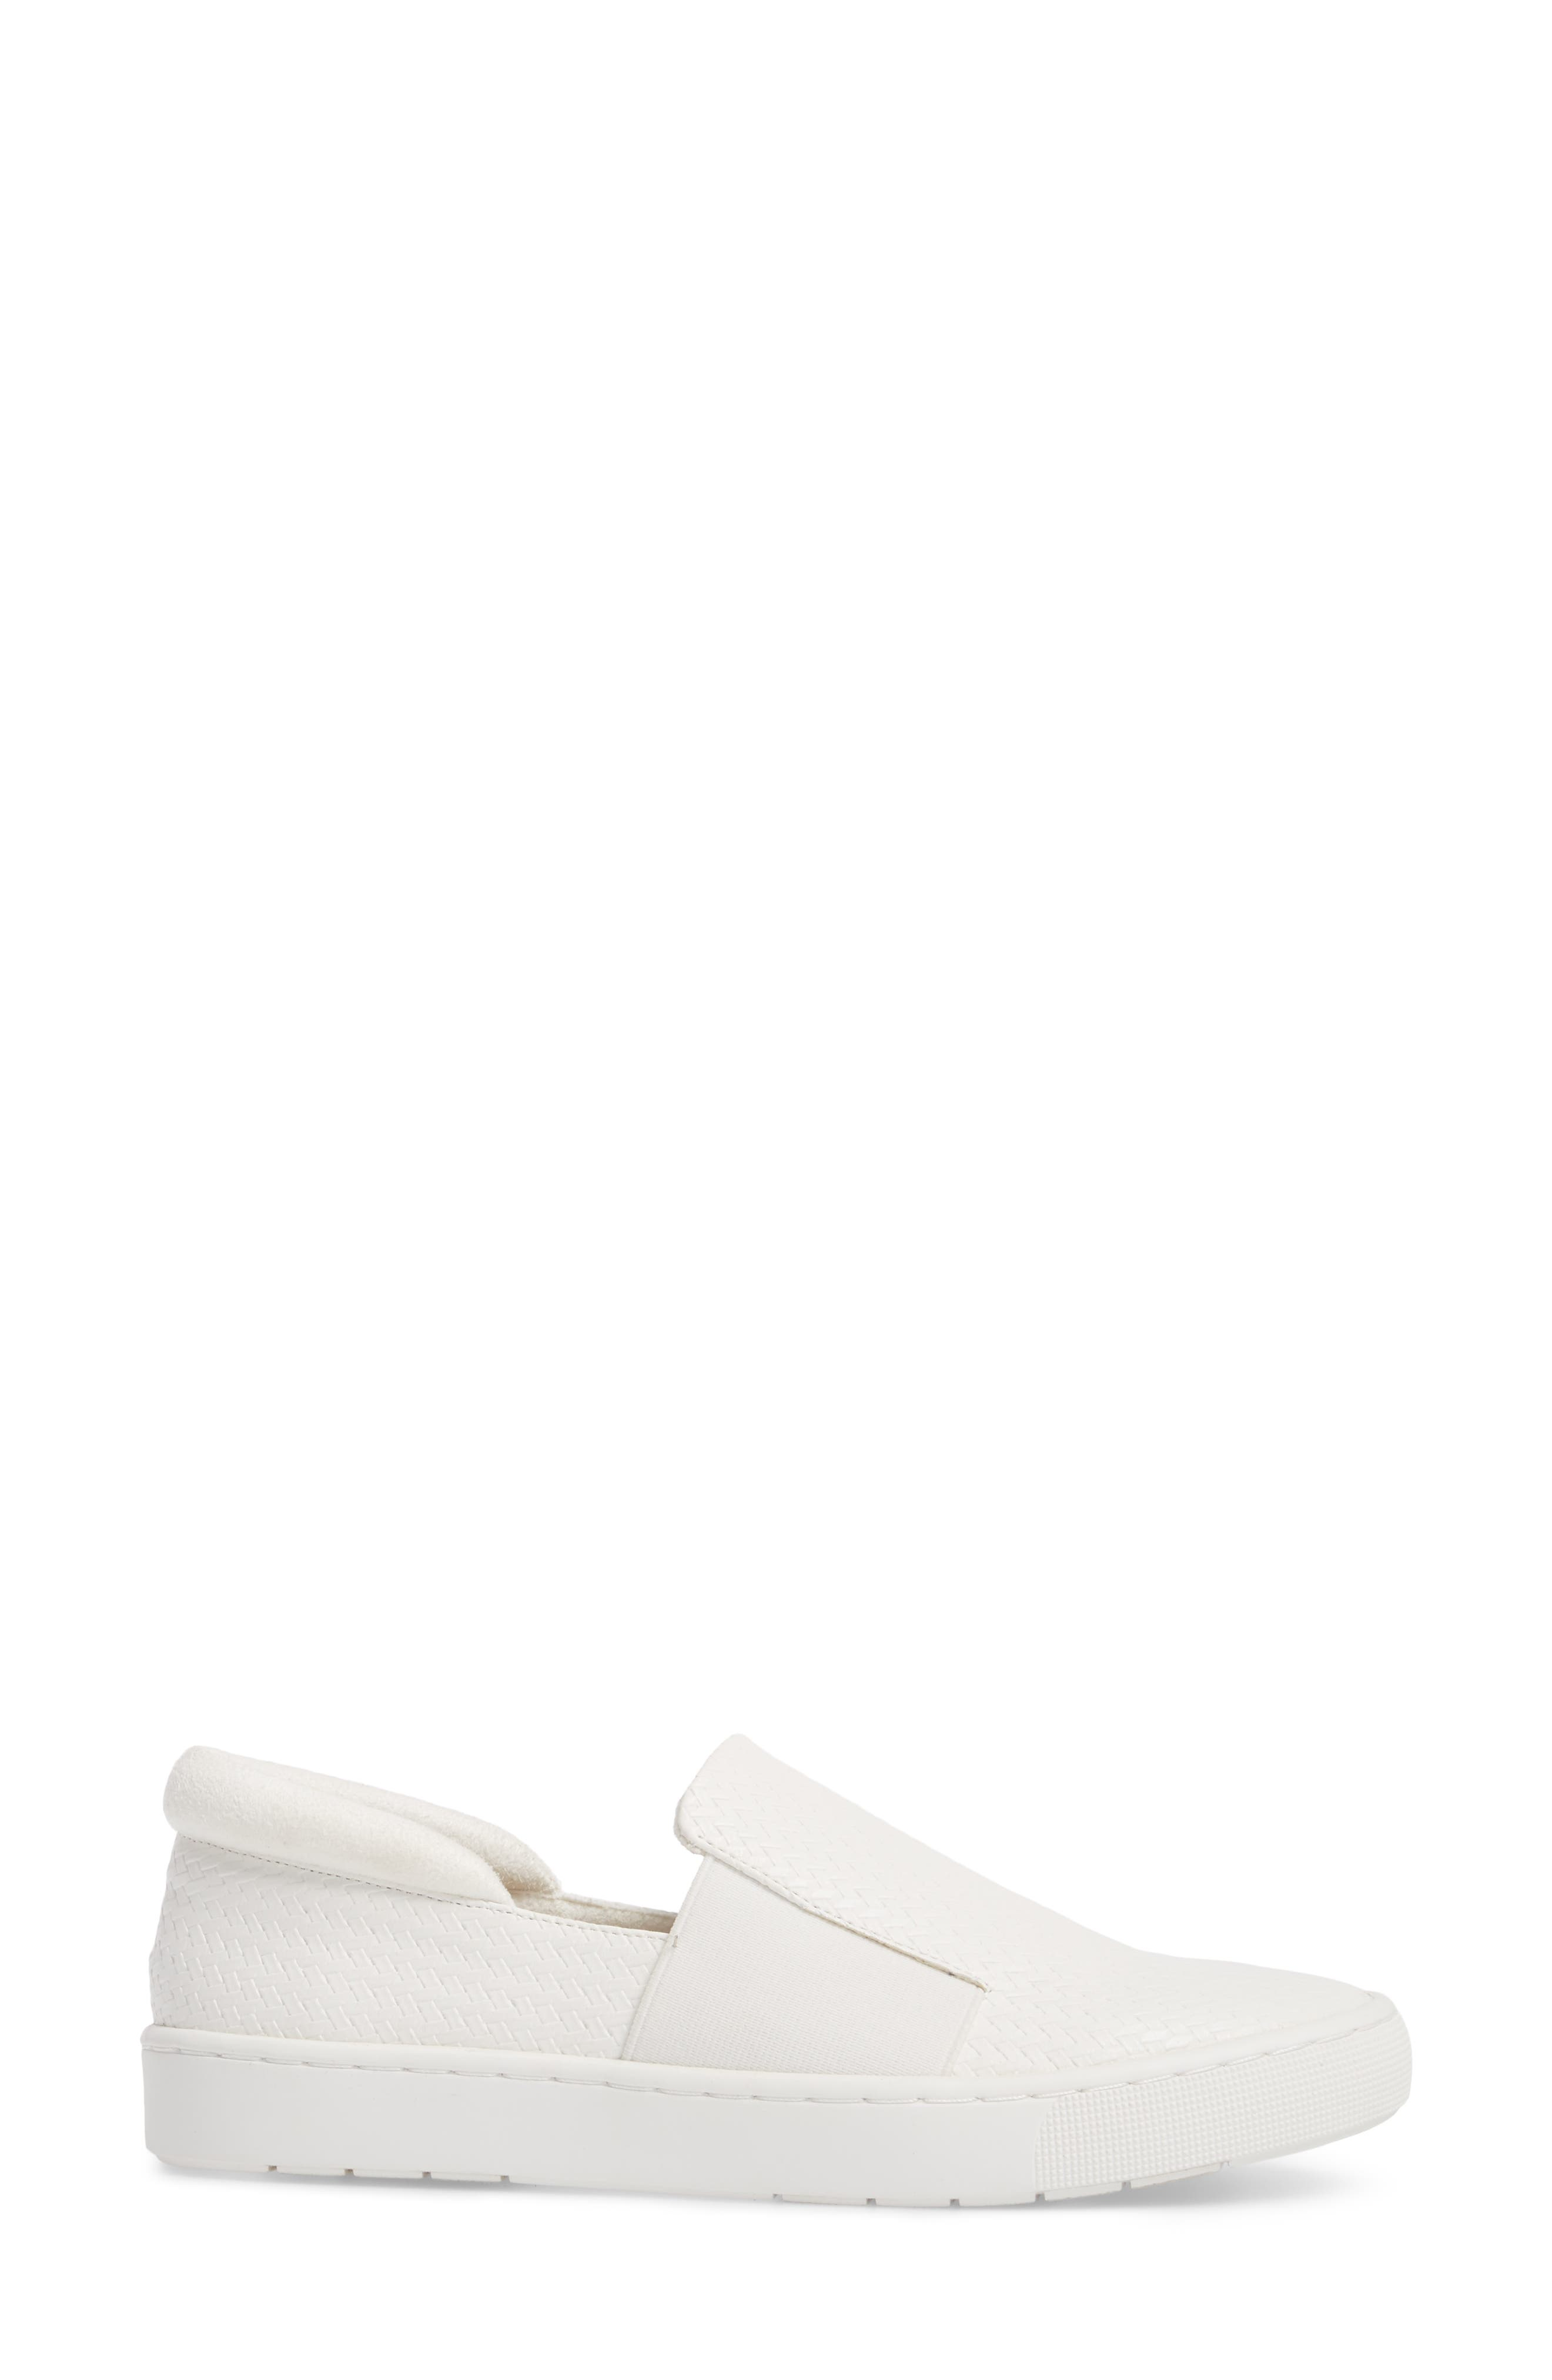 Alternate Image 3  - Bella Vita Ramp II Slip-On Sneaker (Women)